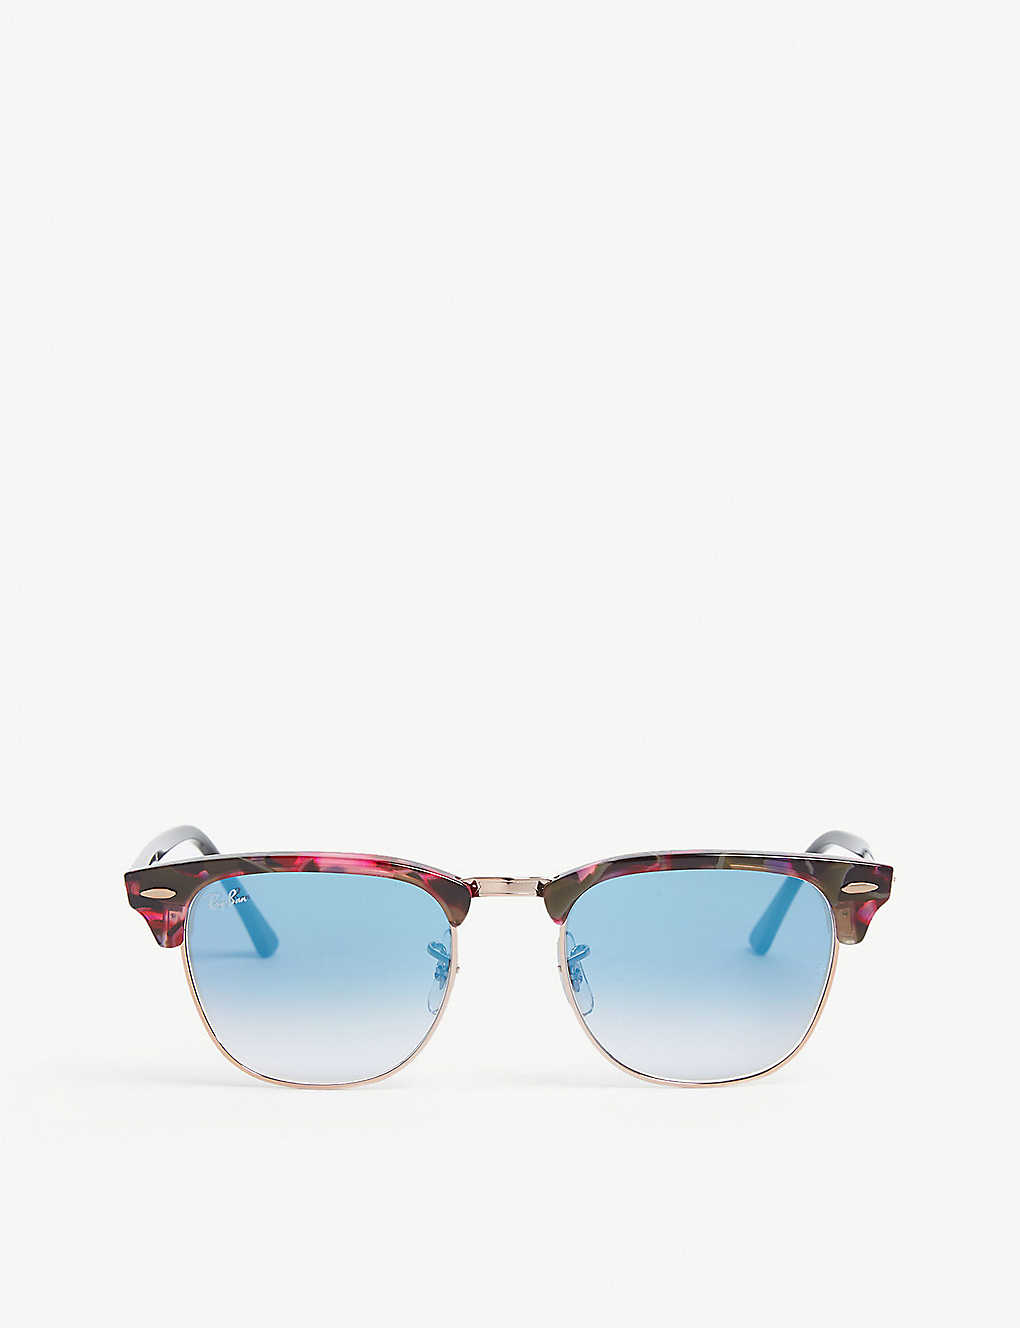 b77ab66c770 RAY-BAN - RB3016 Clubmaster square-frame sunglasses